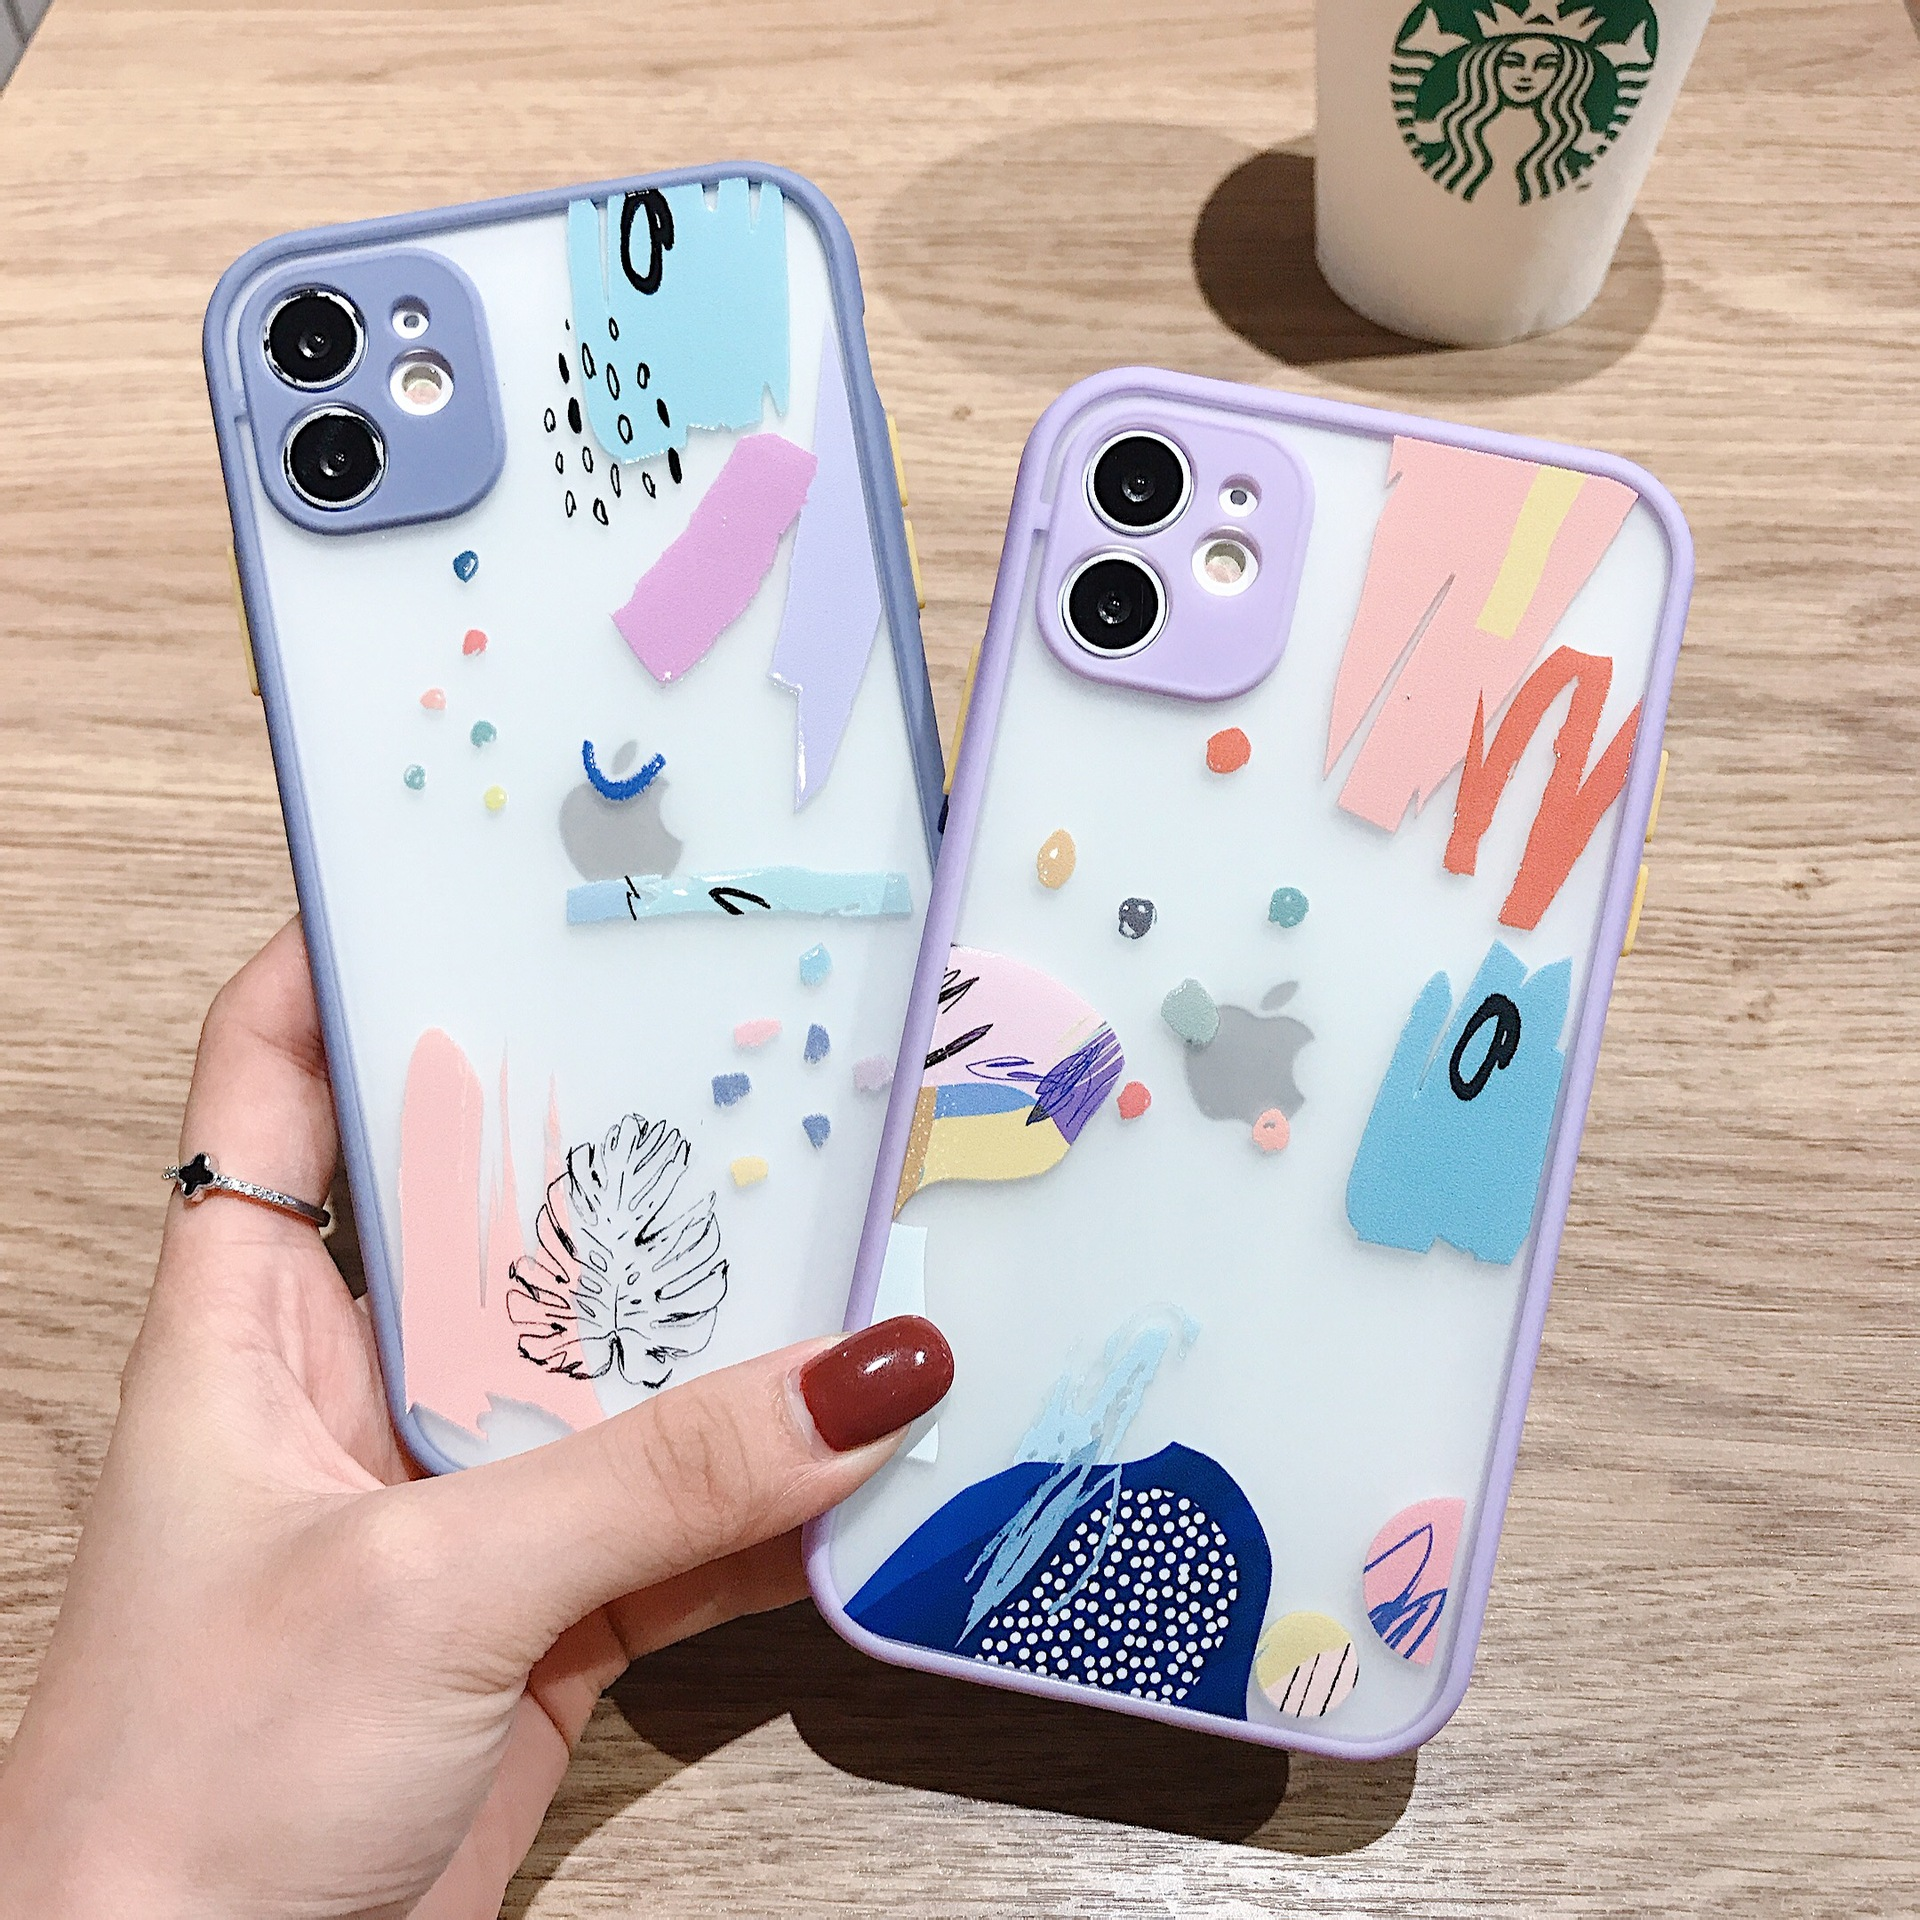 Luxury Colorful Graffiti Pattern Case For iPhone 12 11 Pro Max 8 7 Plus X XS Max XR SE2020 Soft Bumper Matte Phone Cover Coque